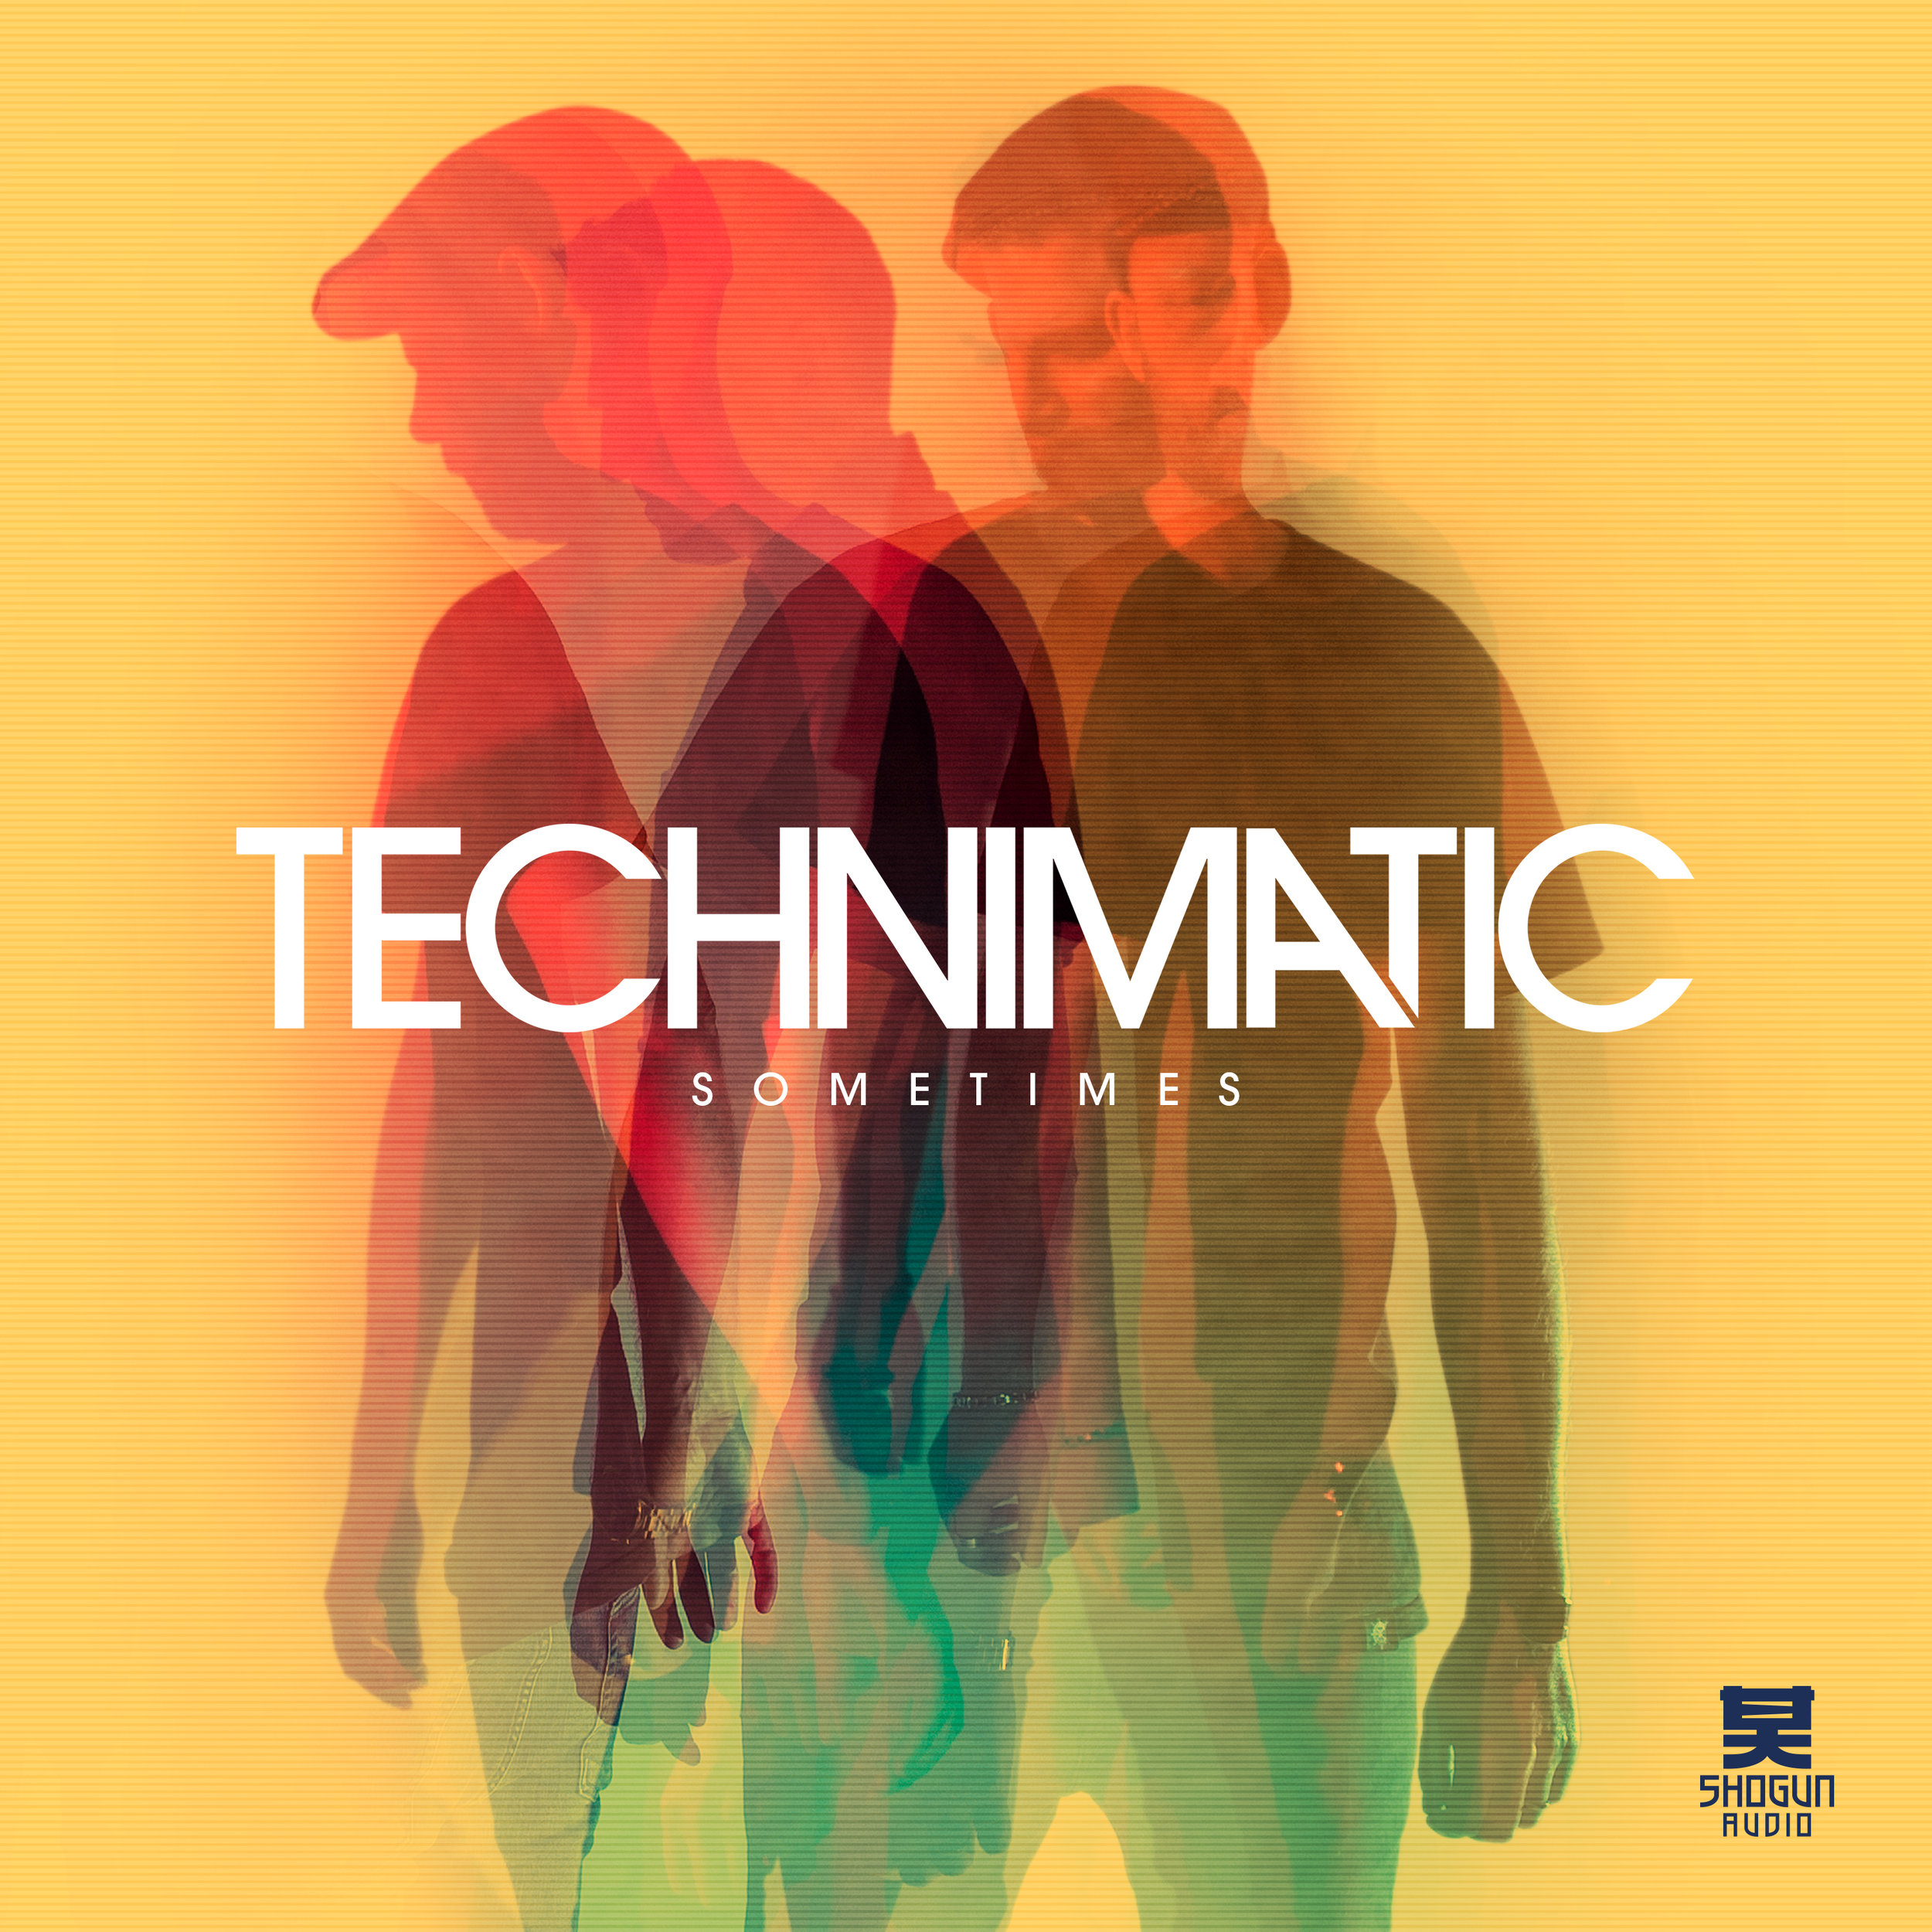 TECHNIMATIC_SOMETIMES_FINAL.jpg